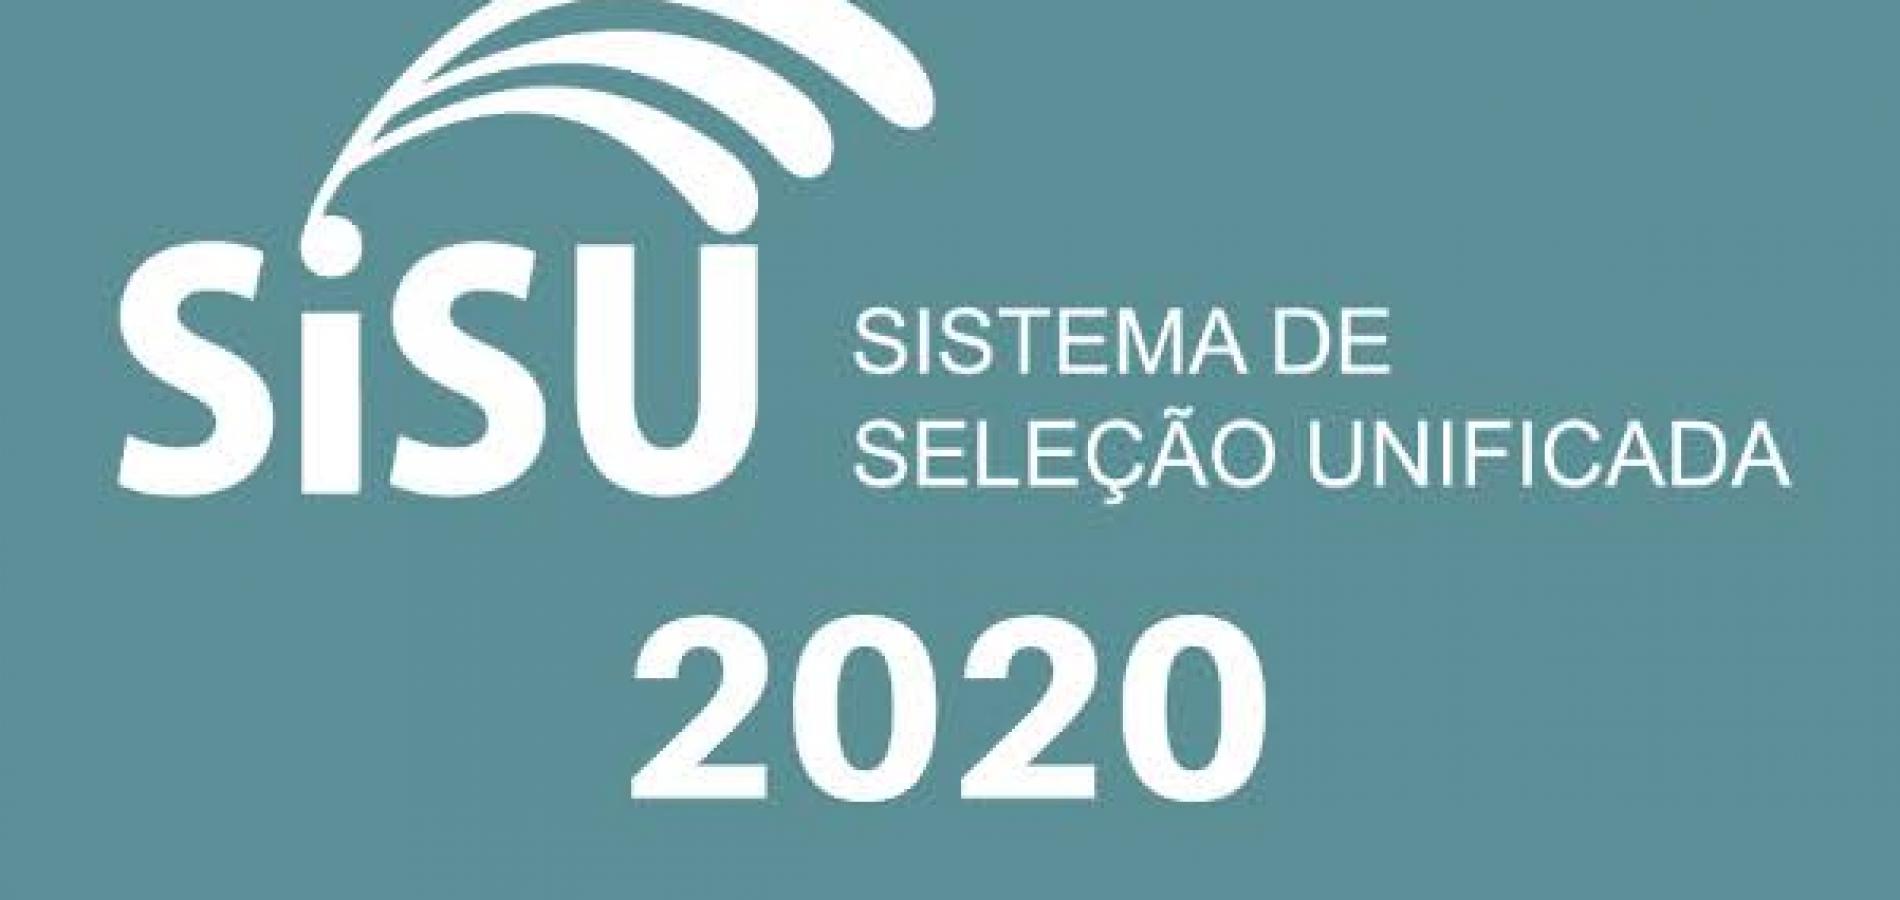 Uespi divulga o edital de lista de espera SiSU 2020; 1ª chamada na sexta-feira (14)